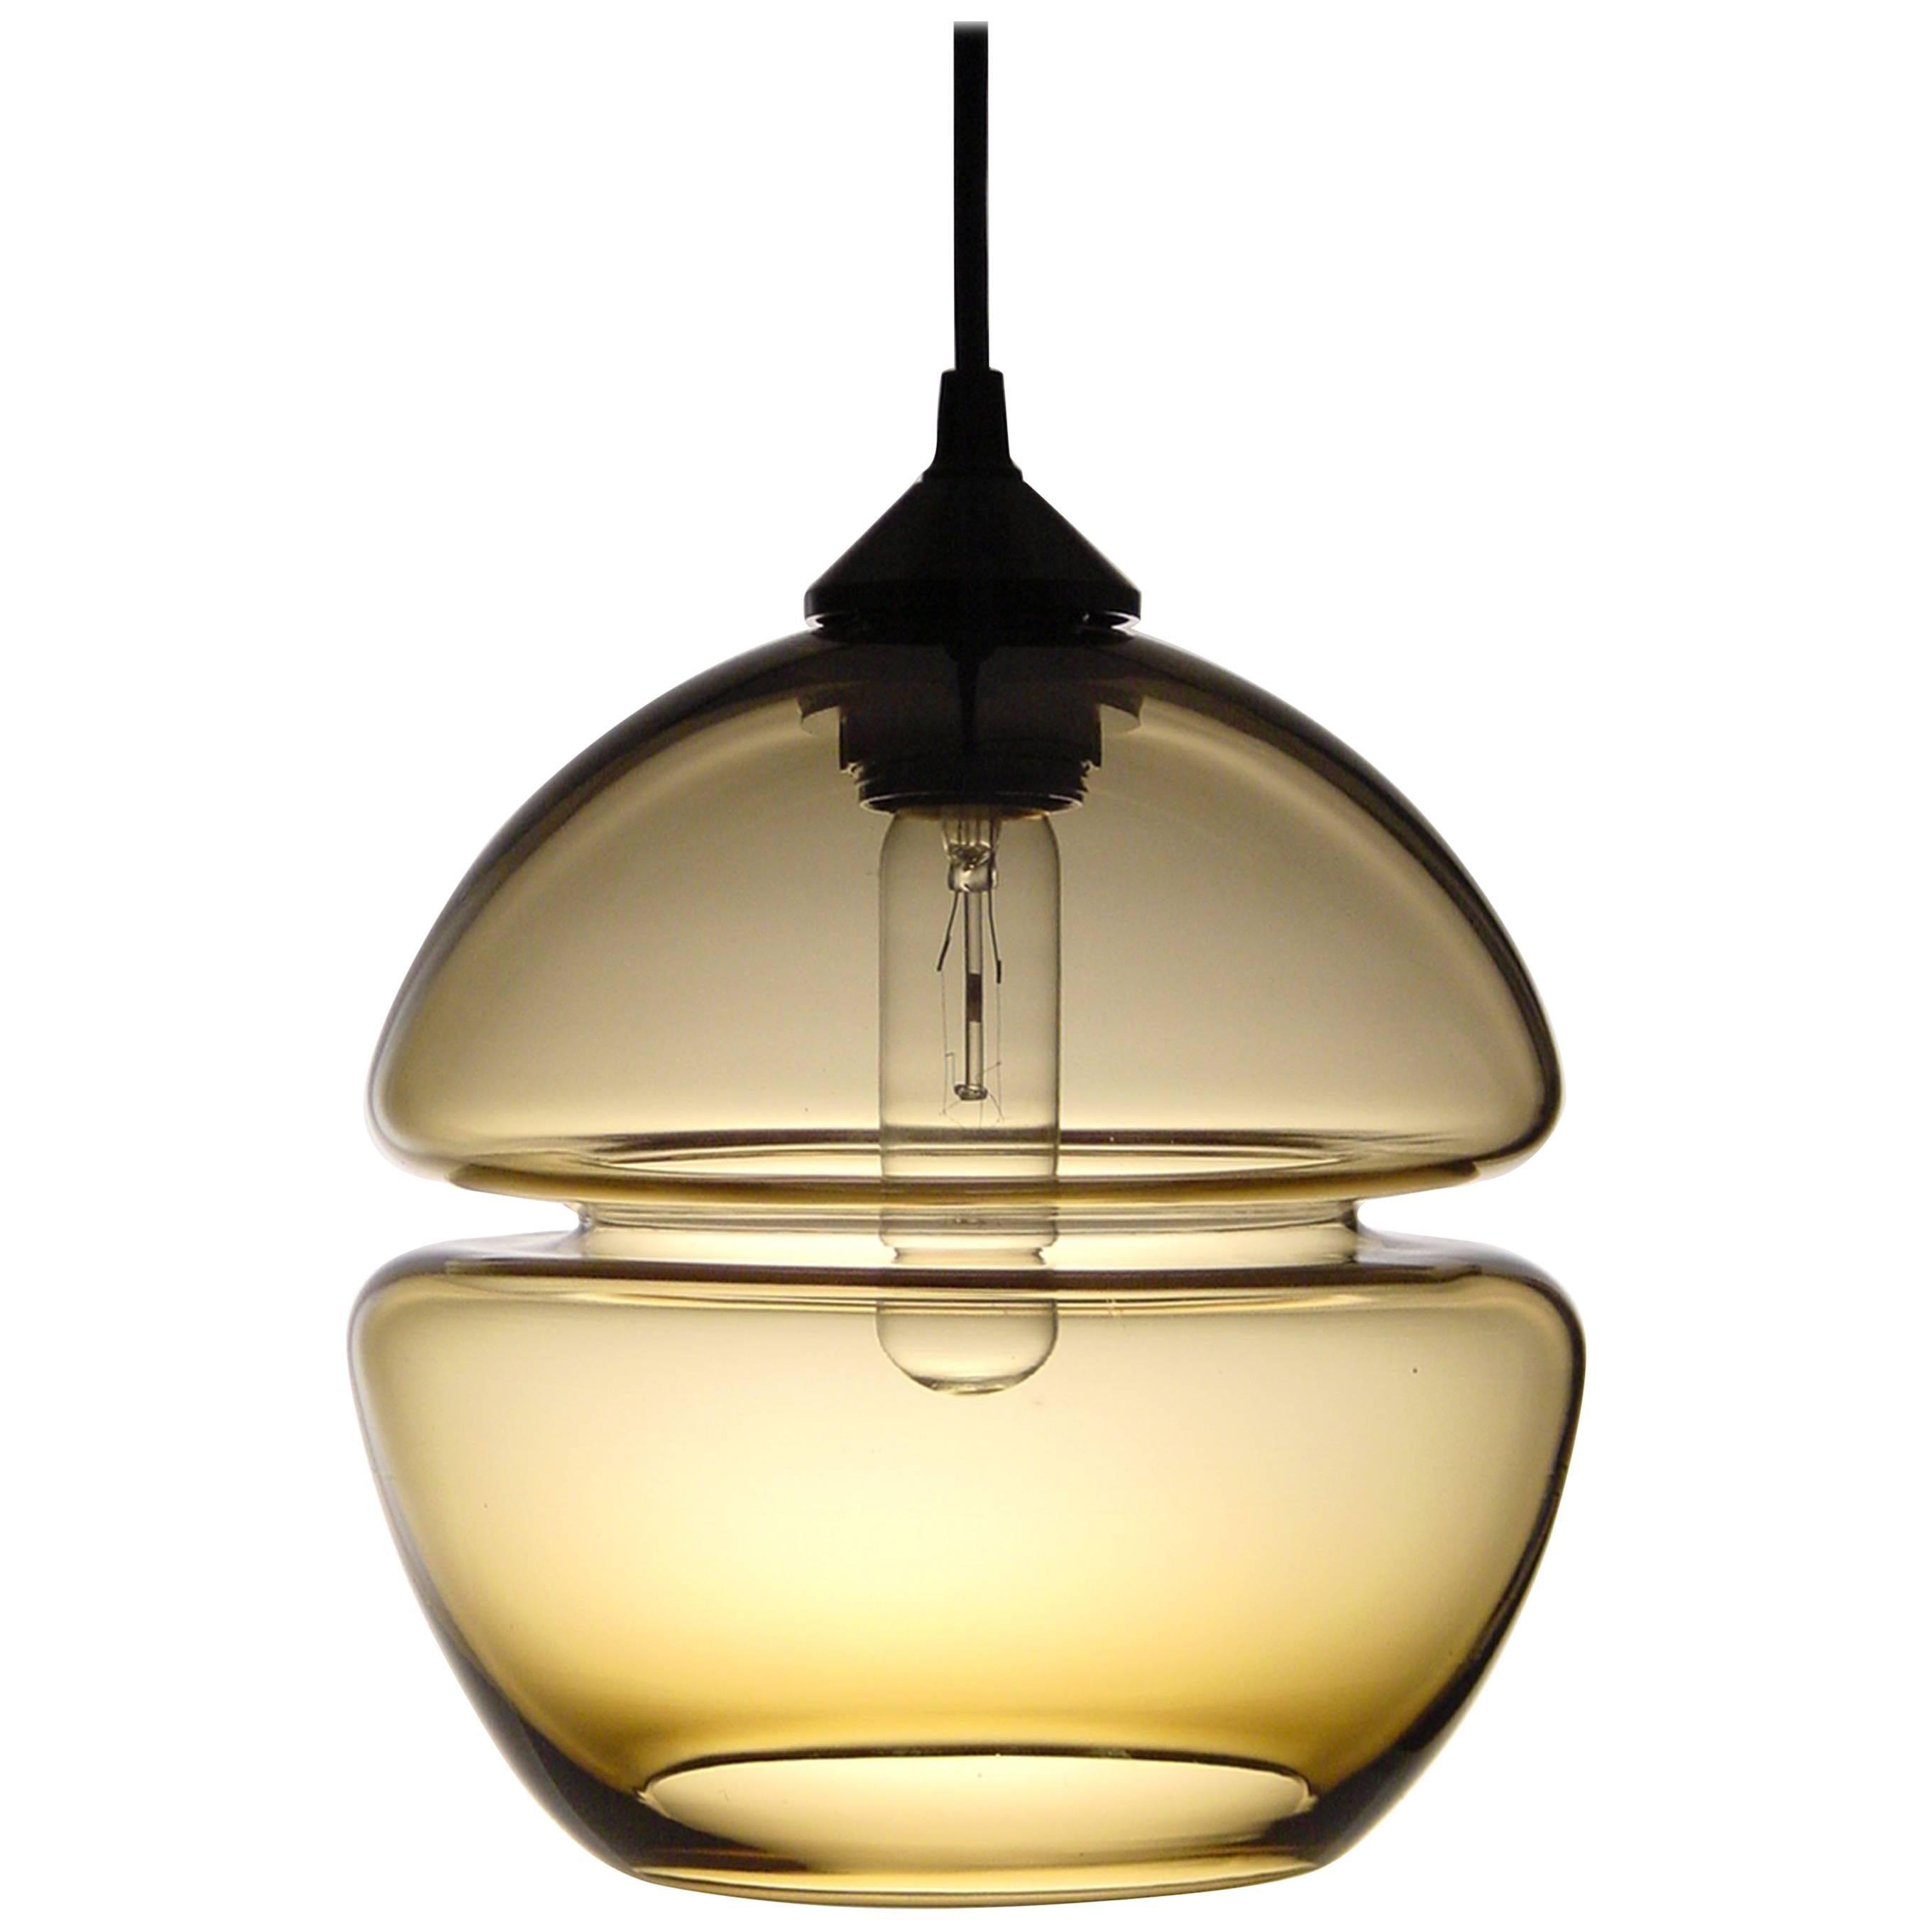 Groove Series Orb Pendant, Contemporary Handmade Glass Lighting